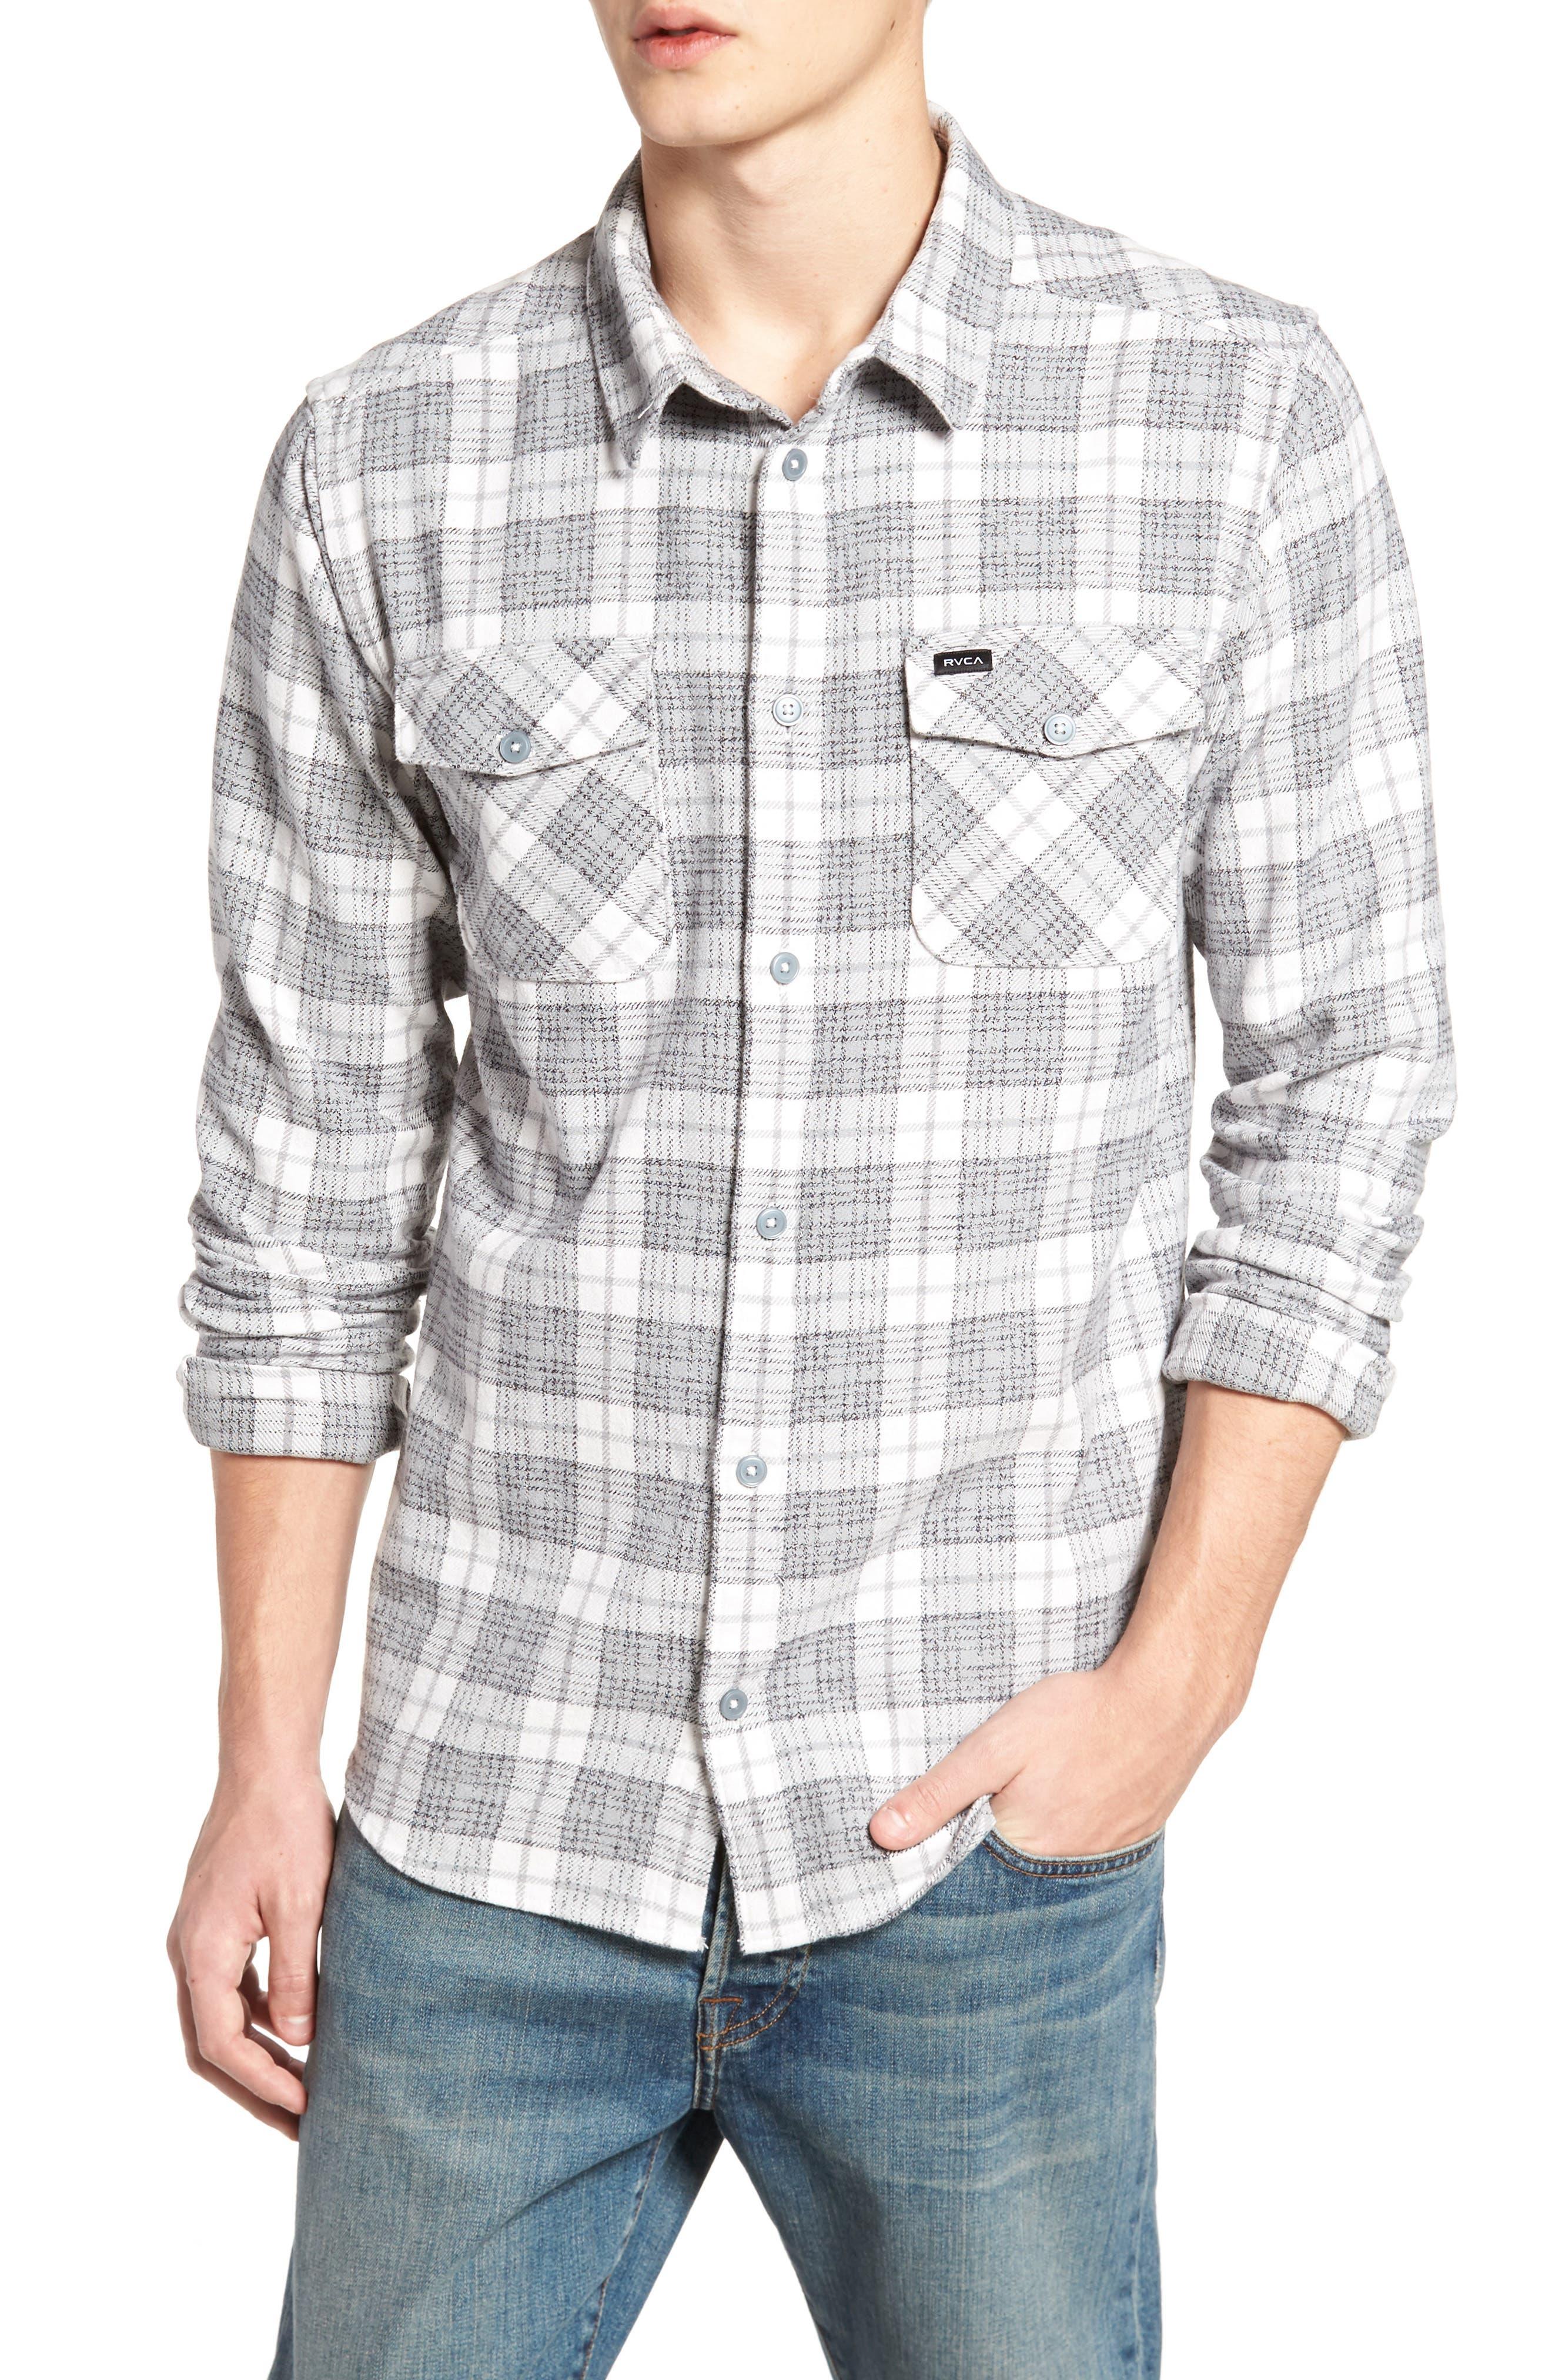 RVCA, 'That'll Work' Trim Fit Plaid Flannel Shirt, Main thumbnail 1, color, ANTIQUE WHITE